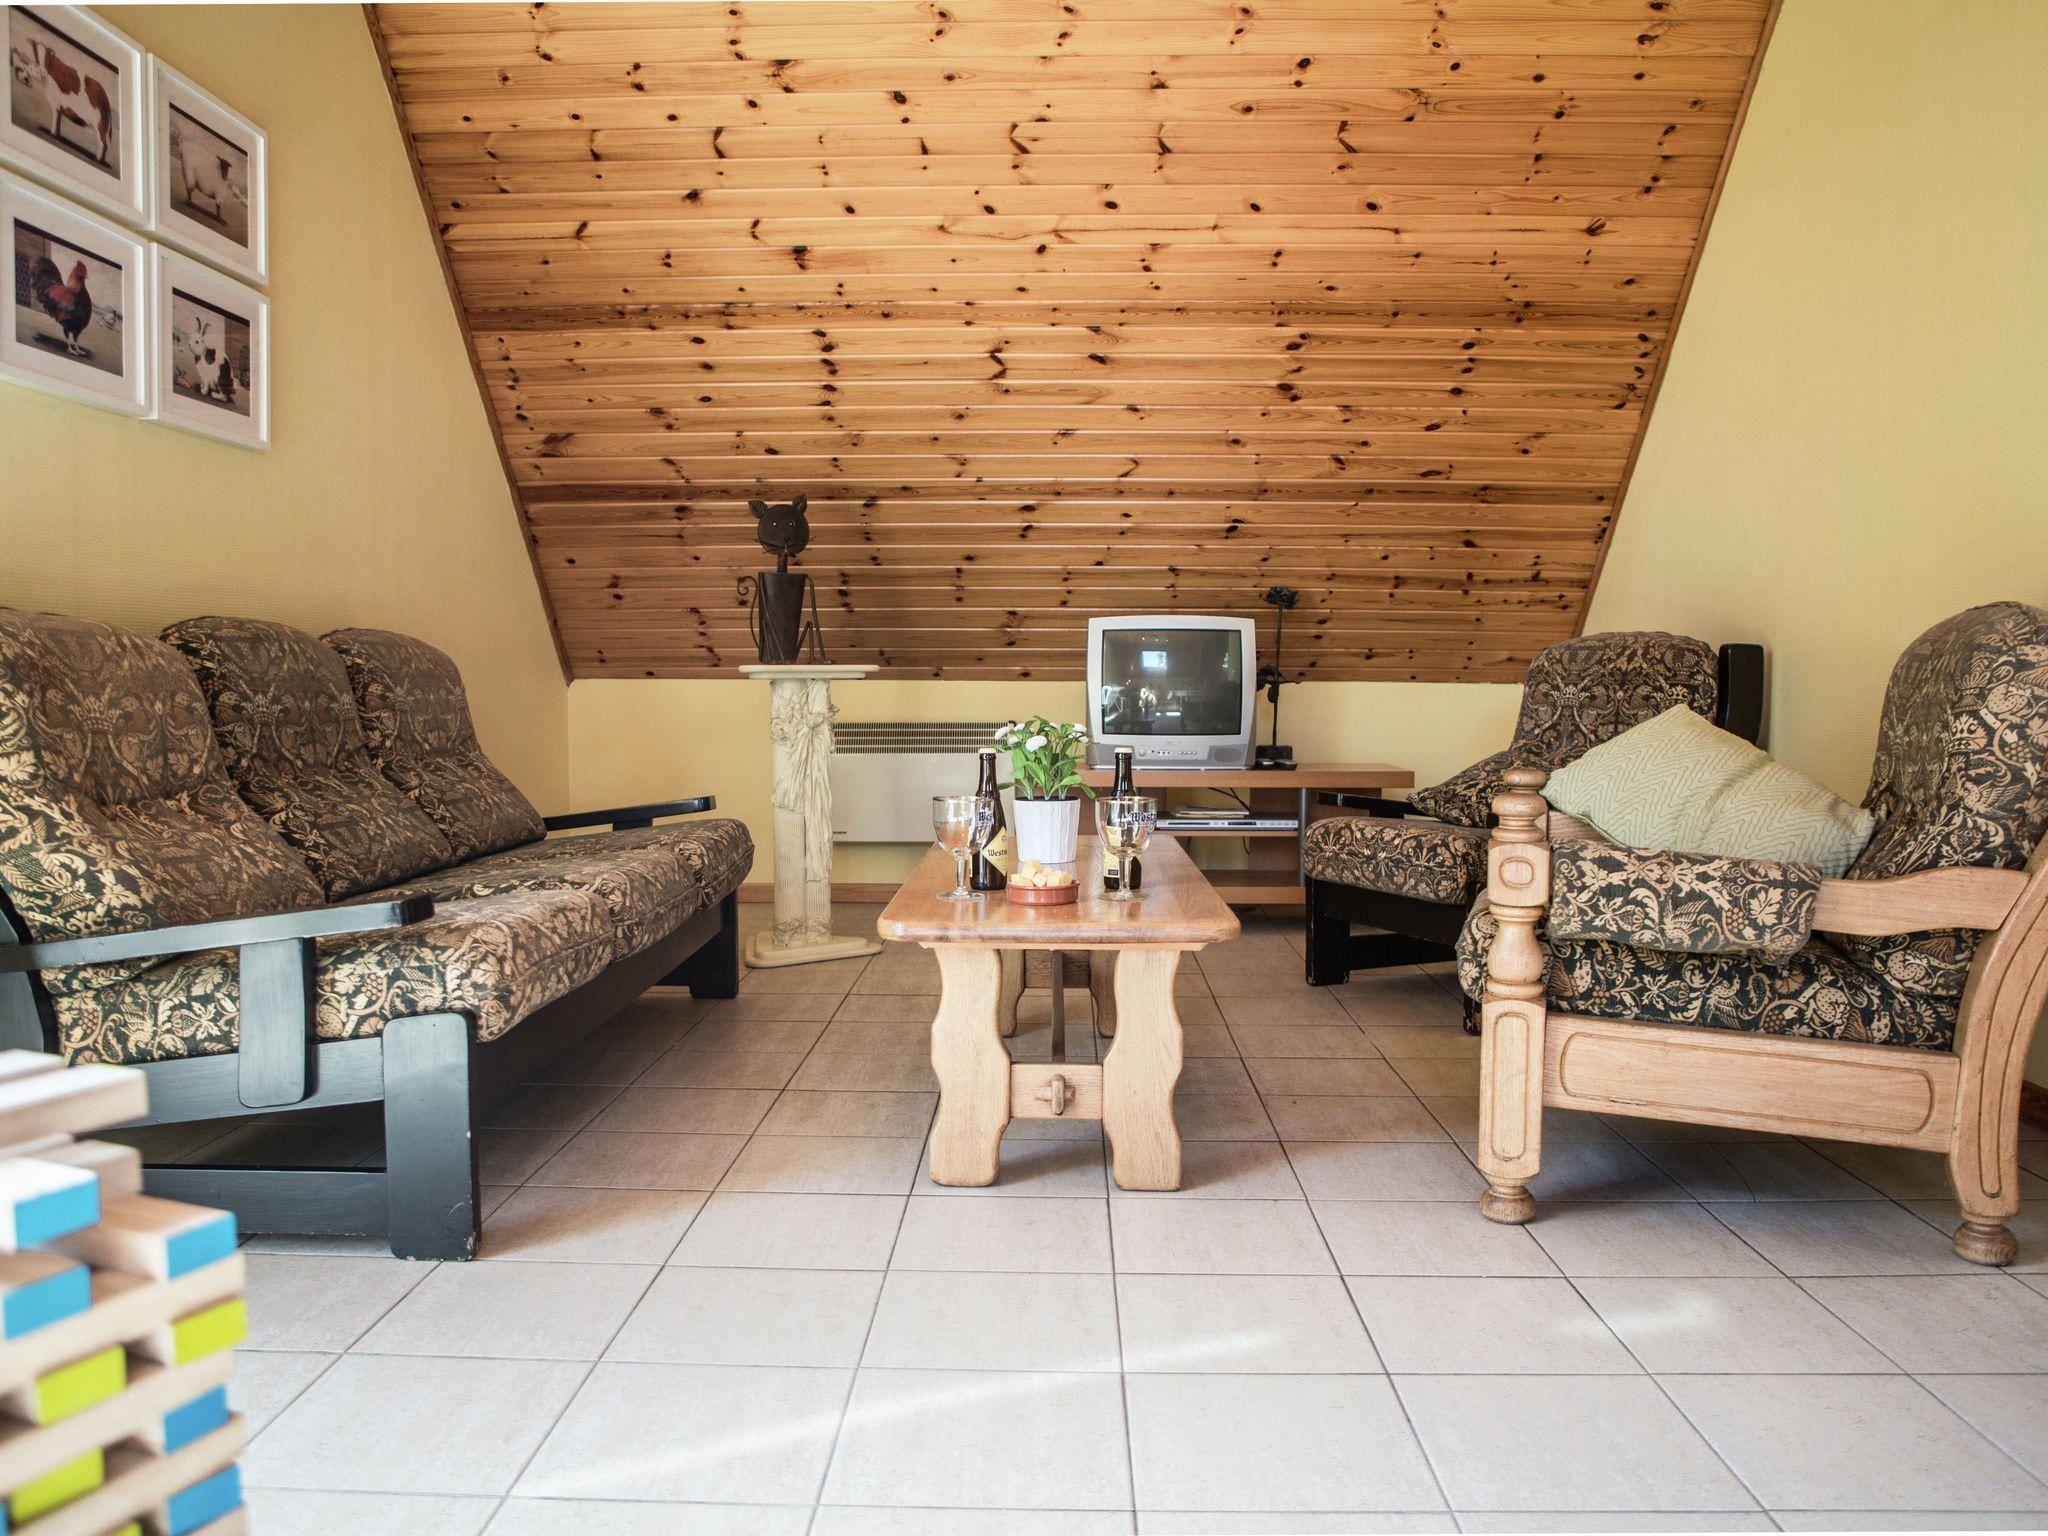 Appartement 39 t sneppel loenhout anvers belgique for Fumer dans la salle de bain